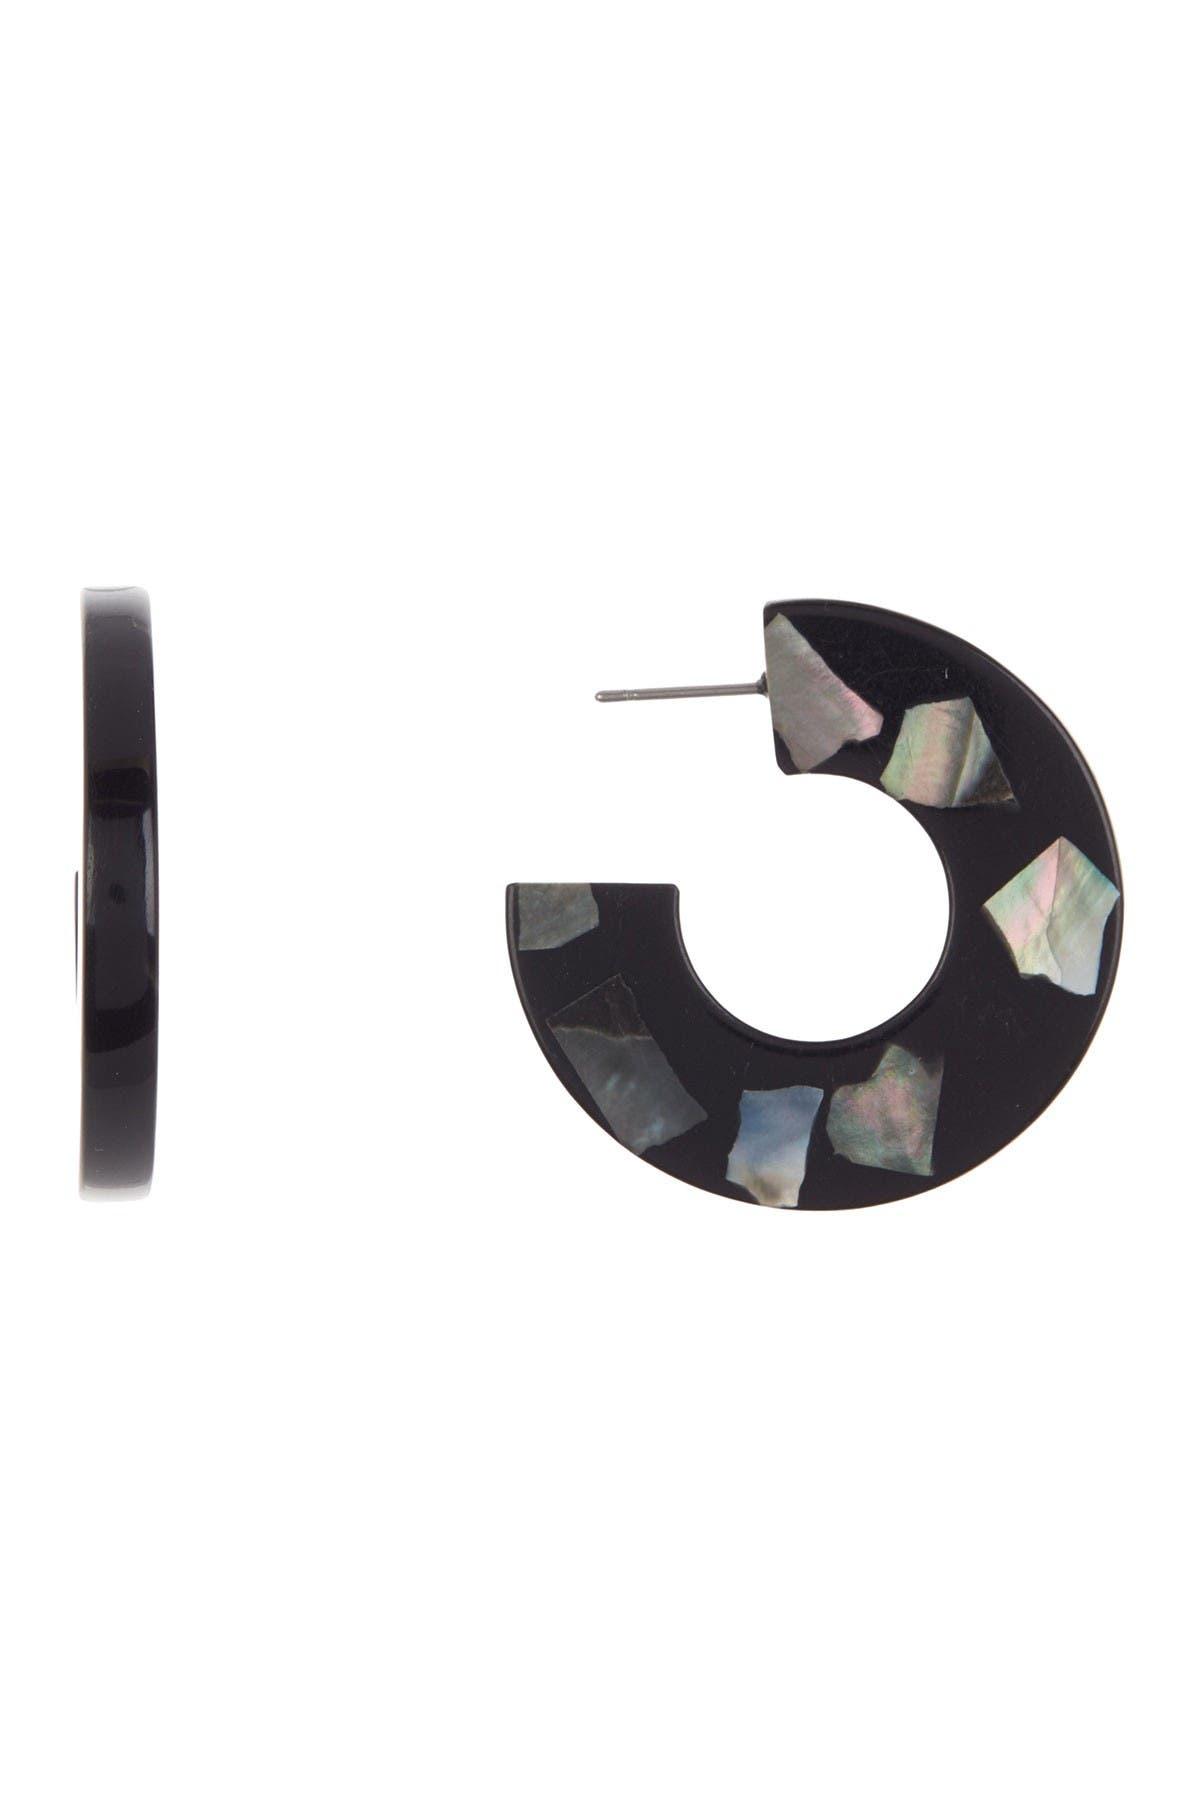 Image of AREA STARS 32mm Resin Open Hoop Earrings